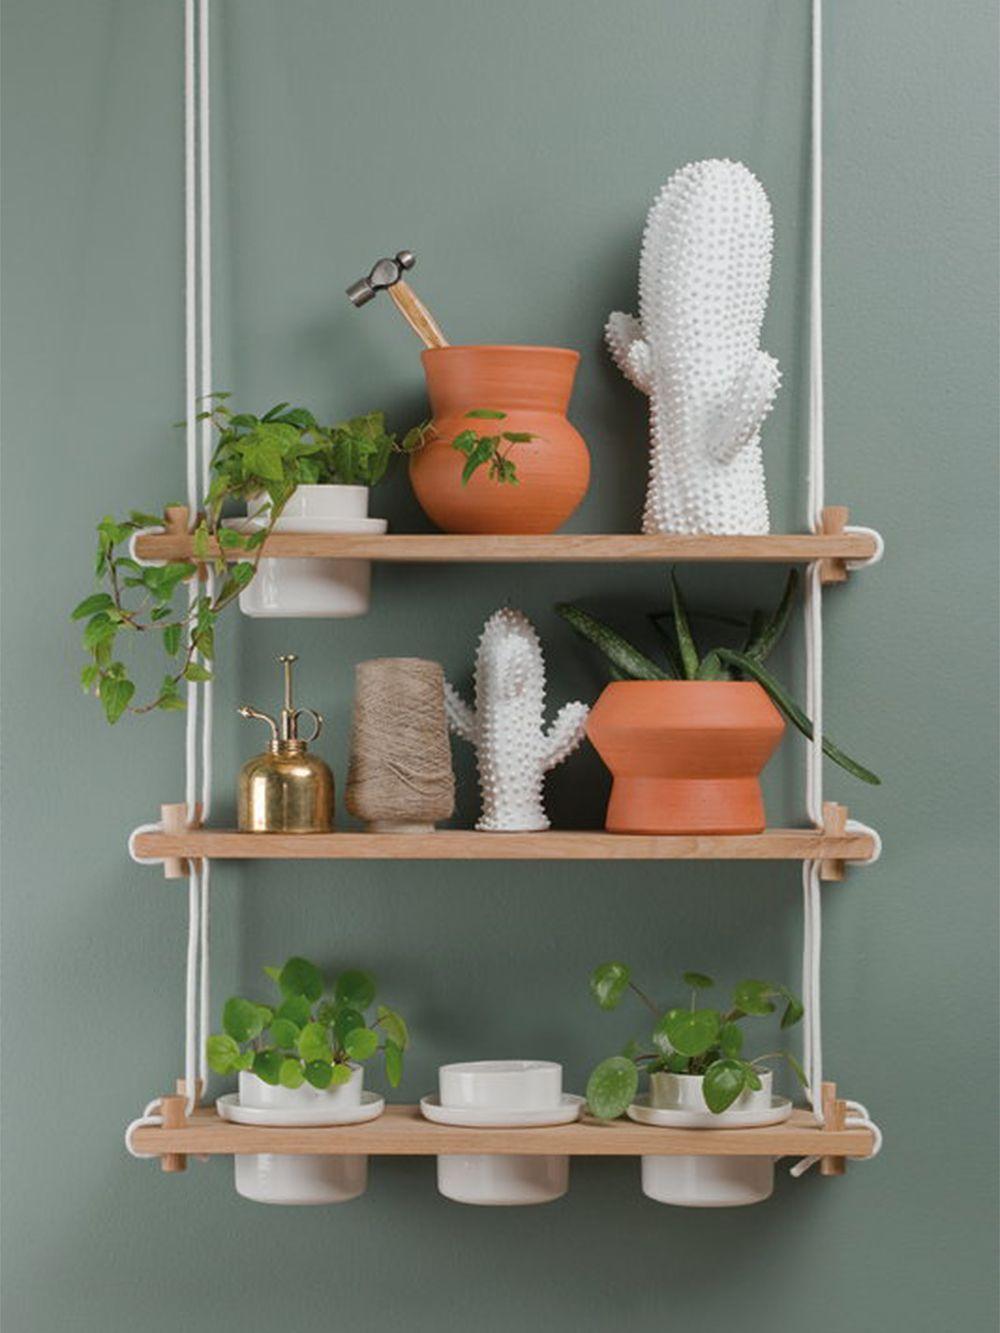 Hakola's Riippu Garden shelf